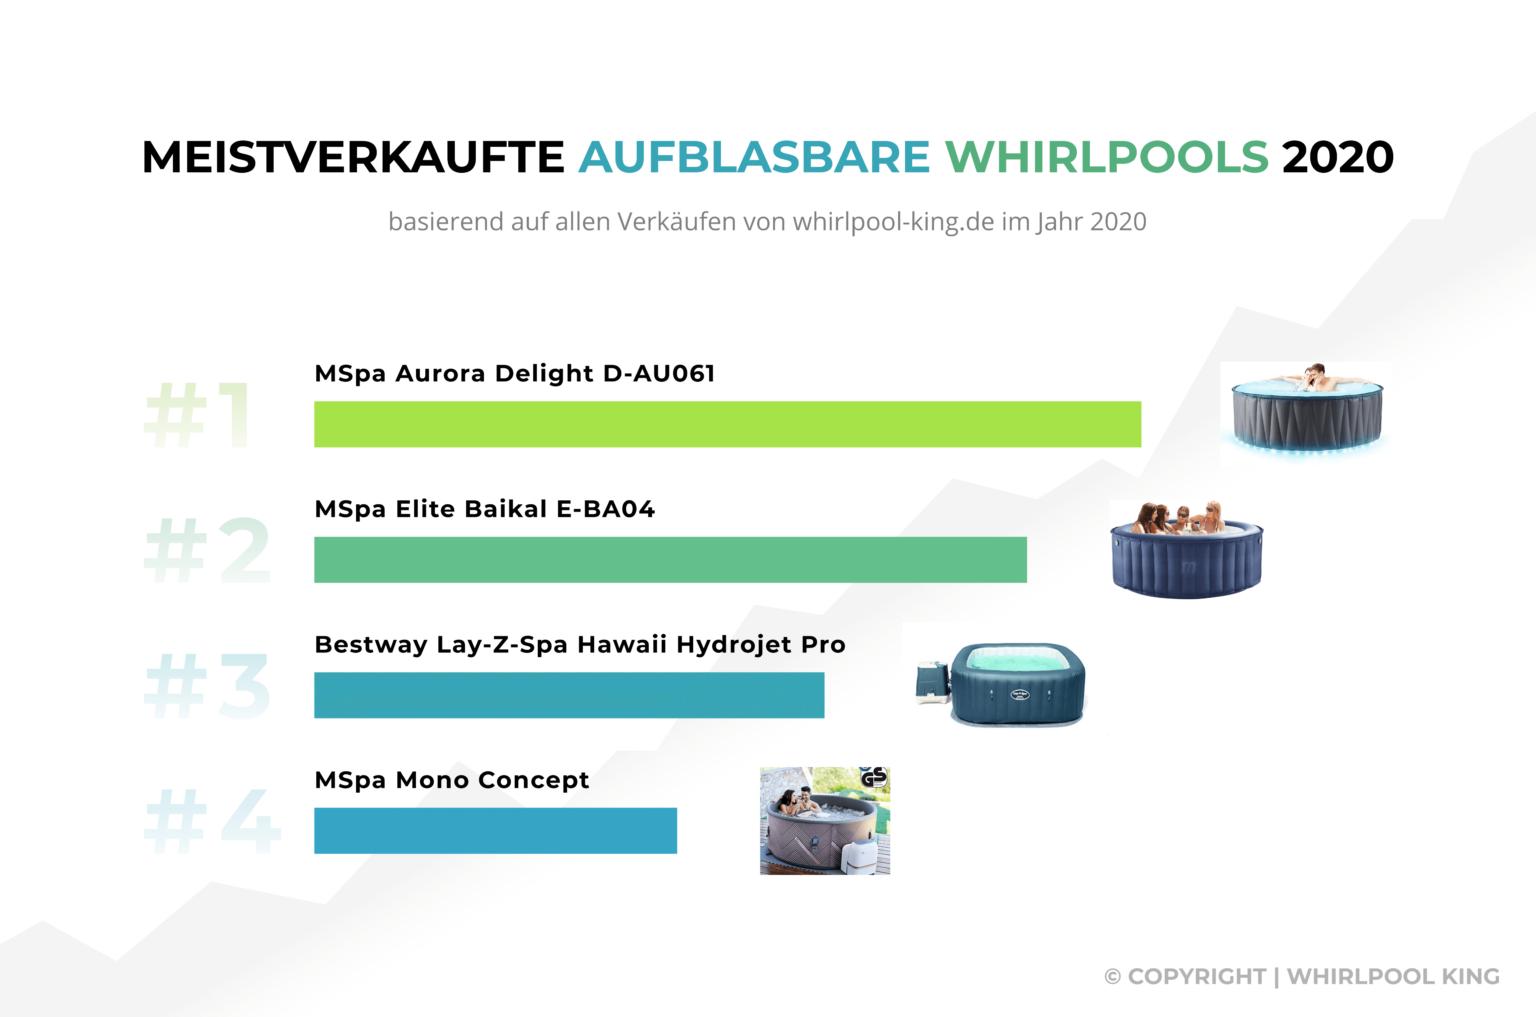 Infografik - aufblasbare Whirlpools Statistik 2020 / 2021